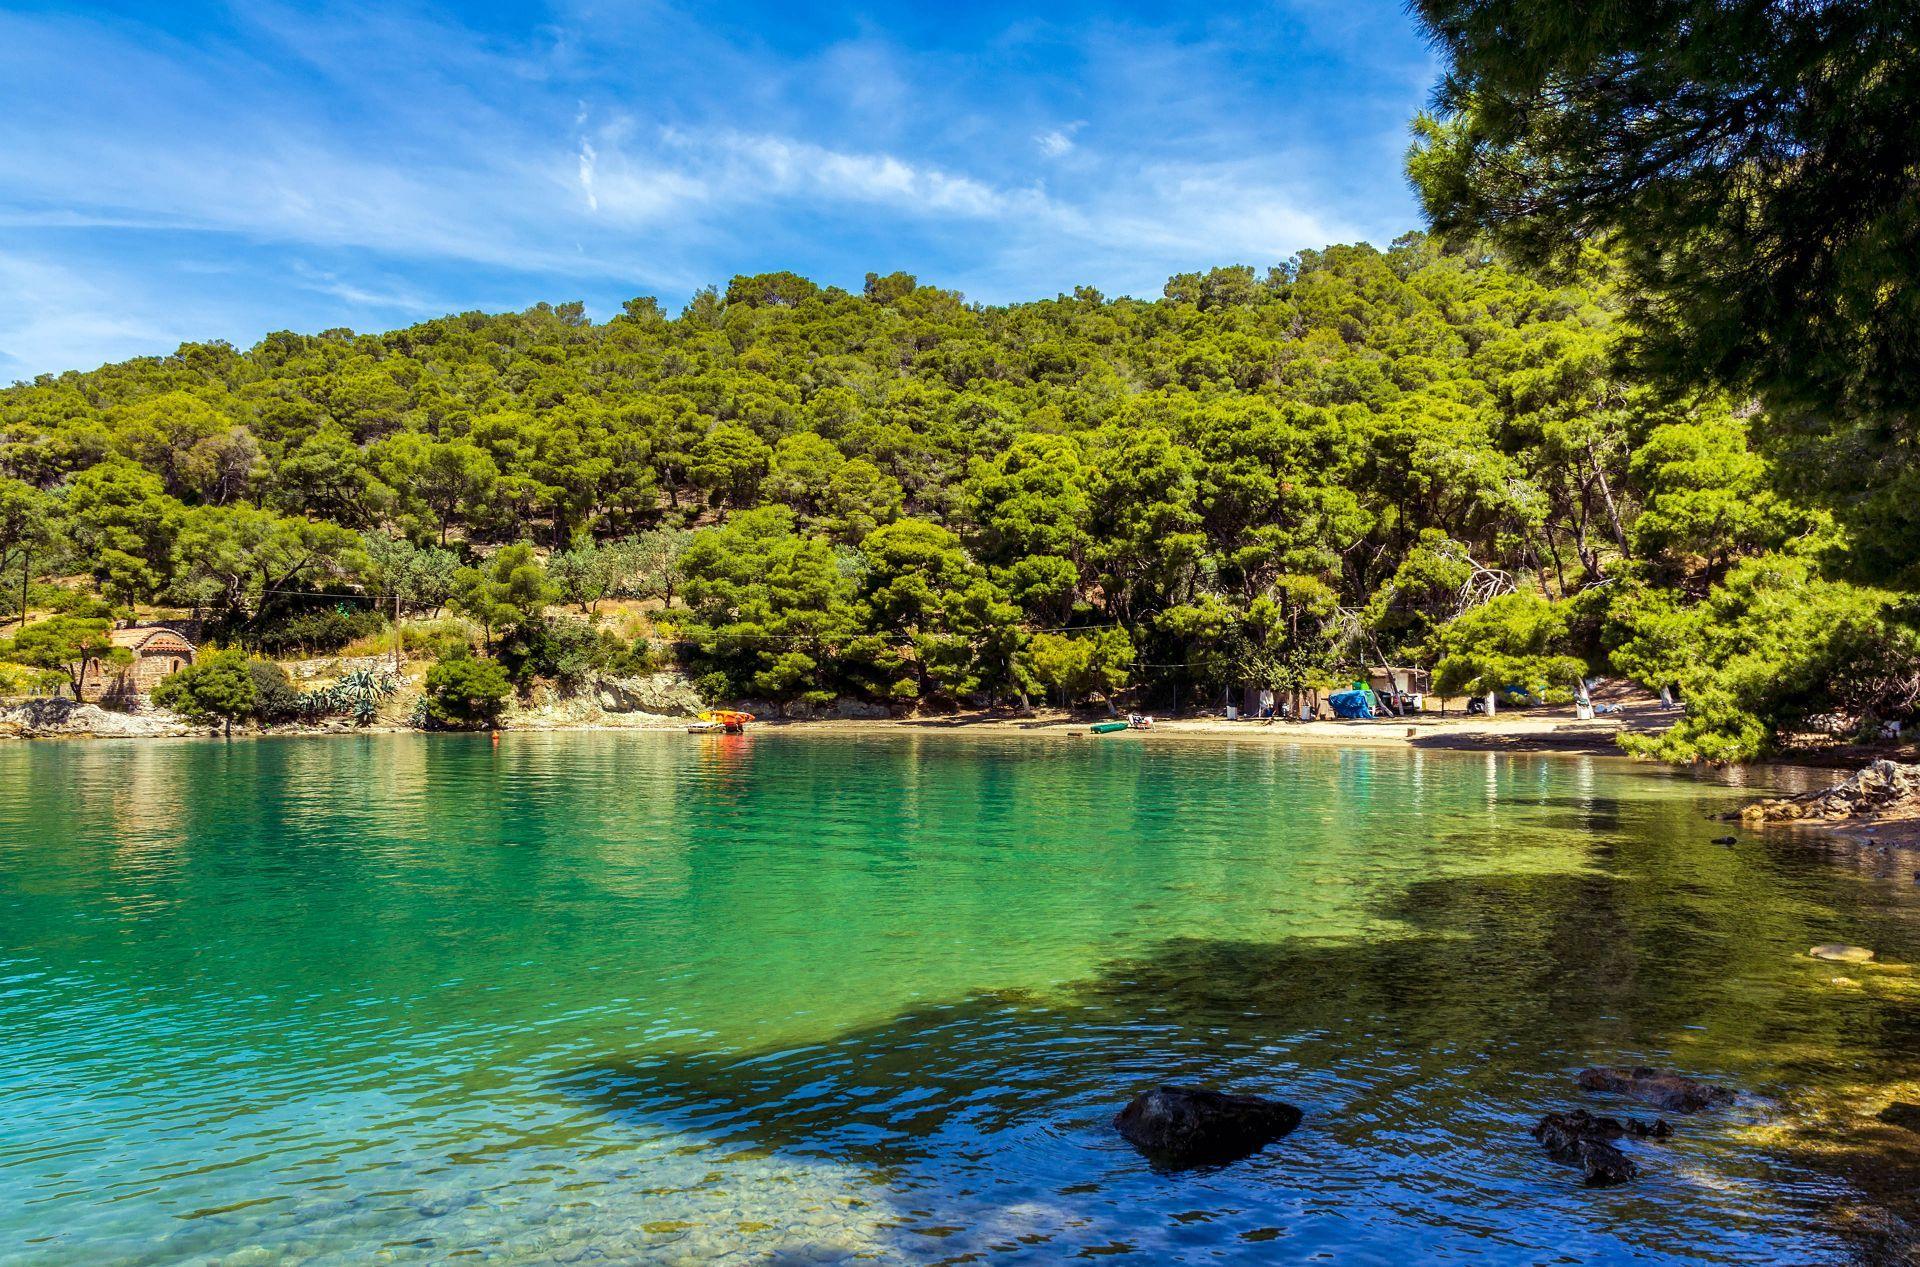 Saronic islands: Love bay beach on Poros island